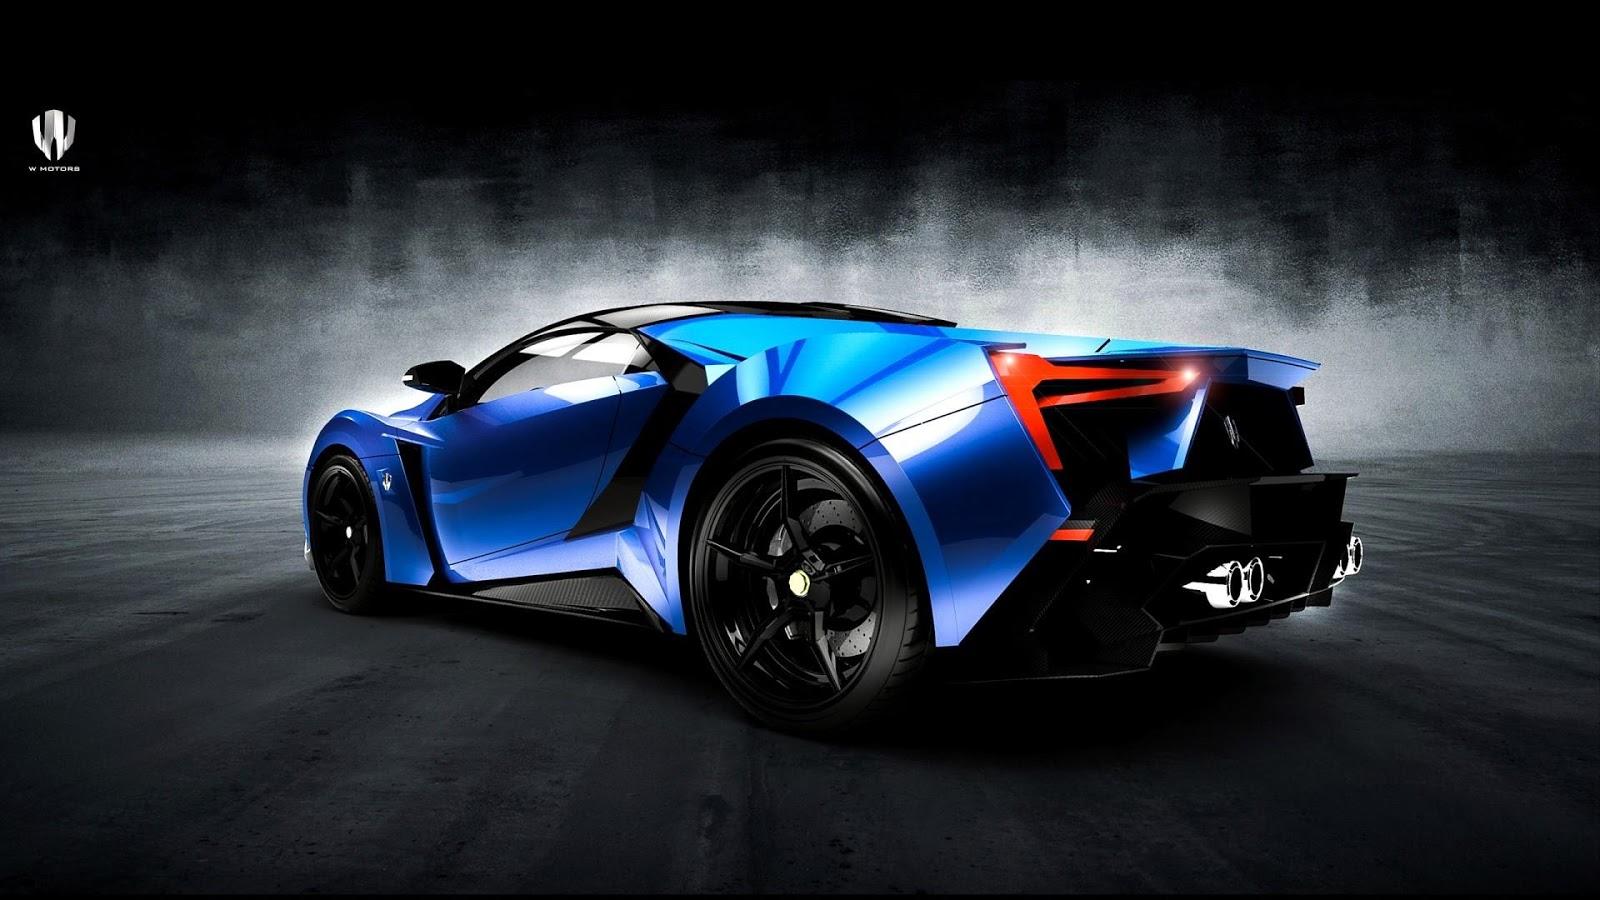 Lykan Hypersport Specs >> Carshighlight.com - cars review, concept, Specs, Price: Lykan Hypersport 2017 Review, Specs, Price